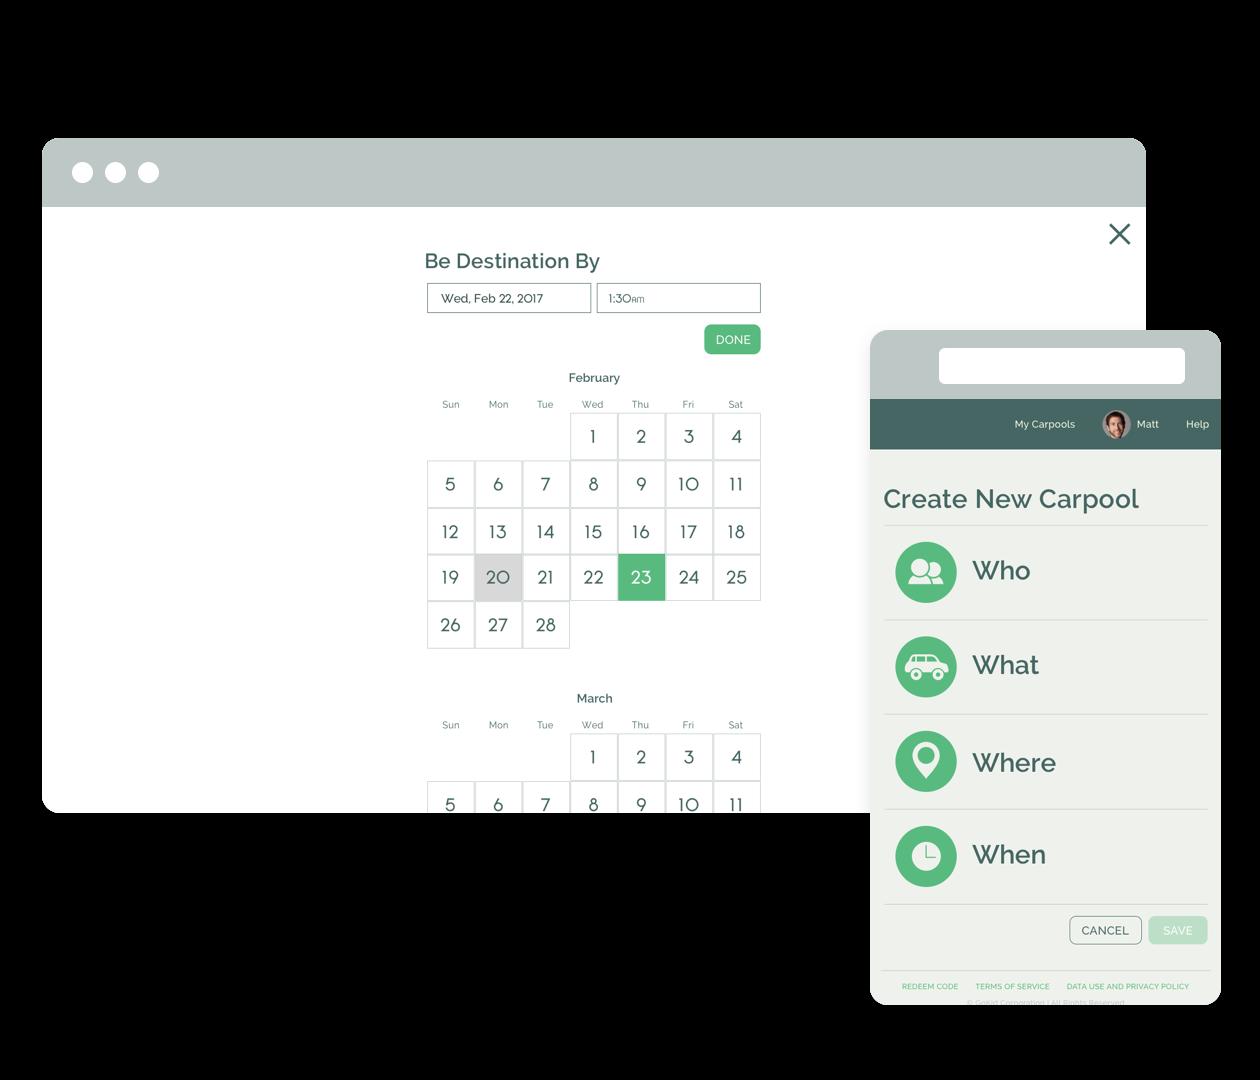 gokid carpool app save time carpool with families you trust